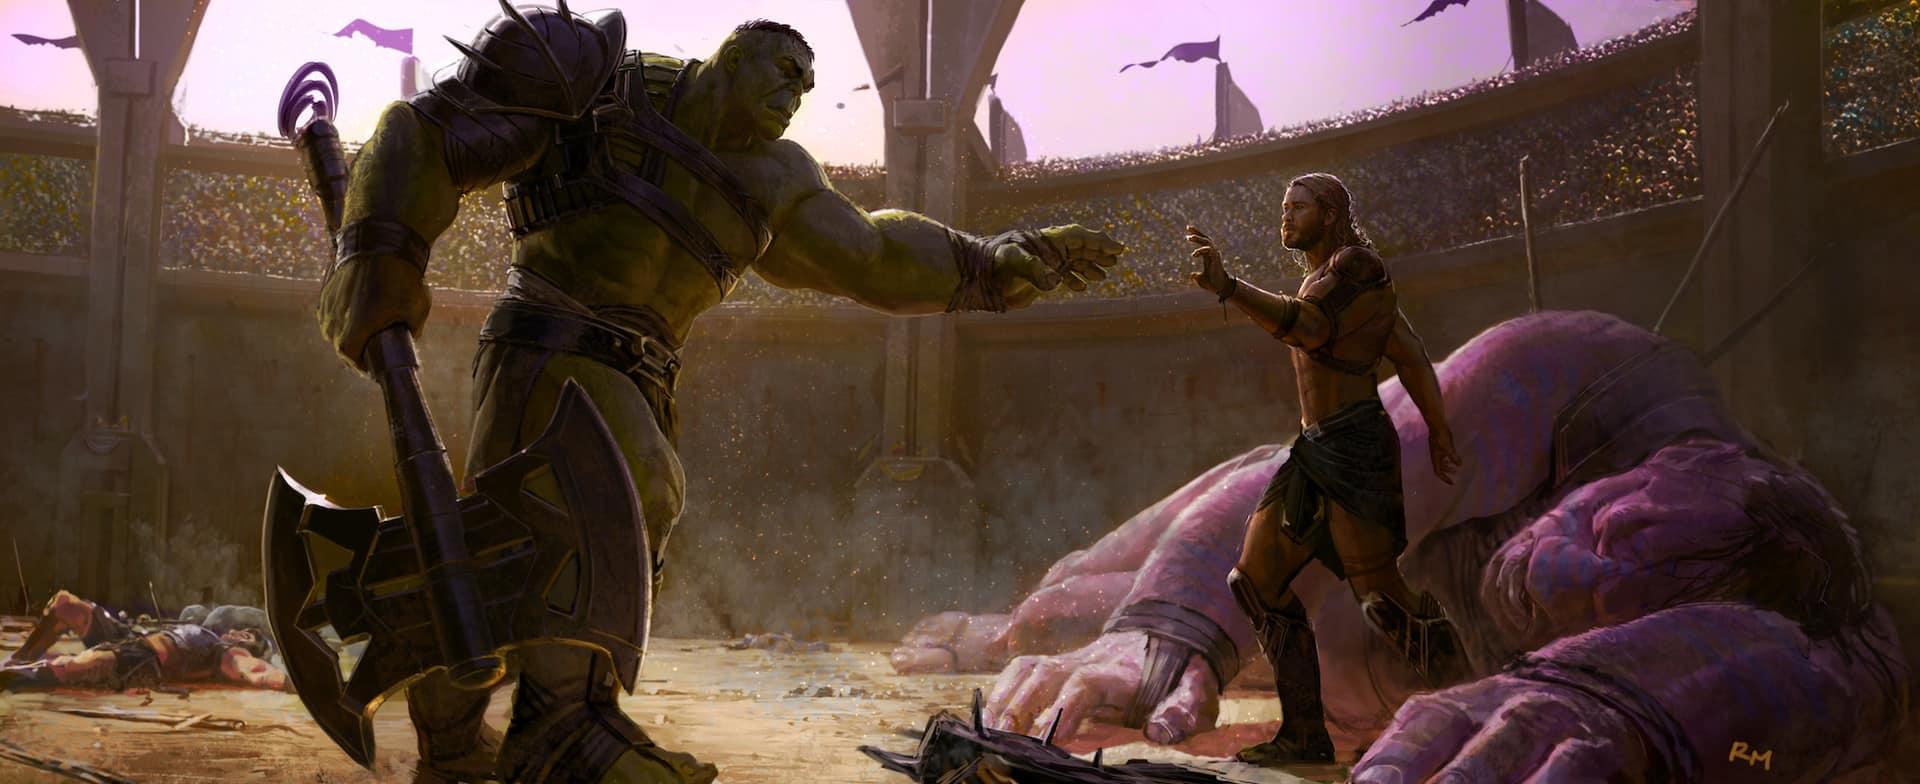 Thor: Ragnarok ryan meinerding hulk vs thor